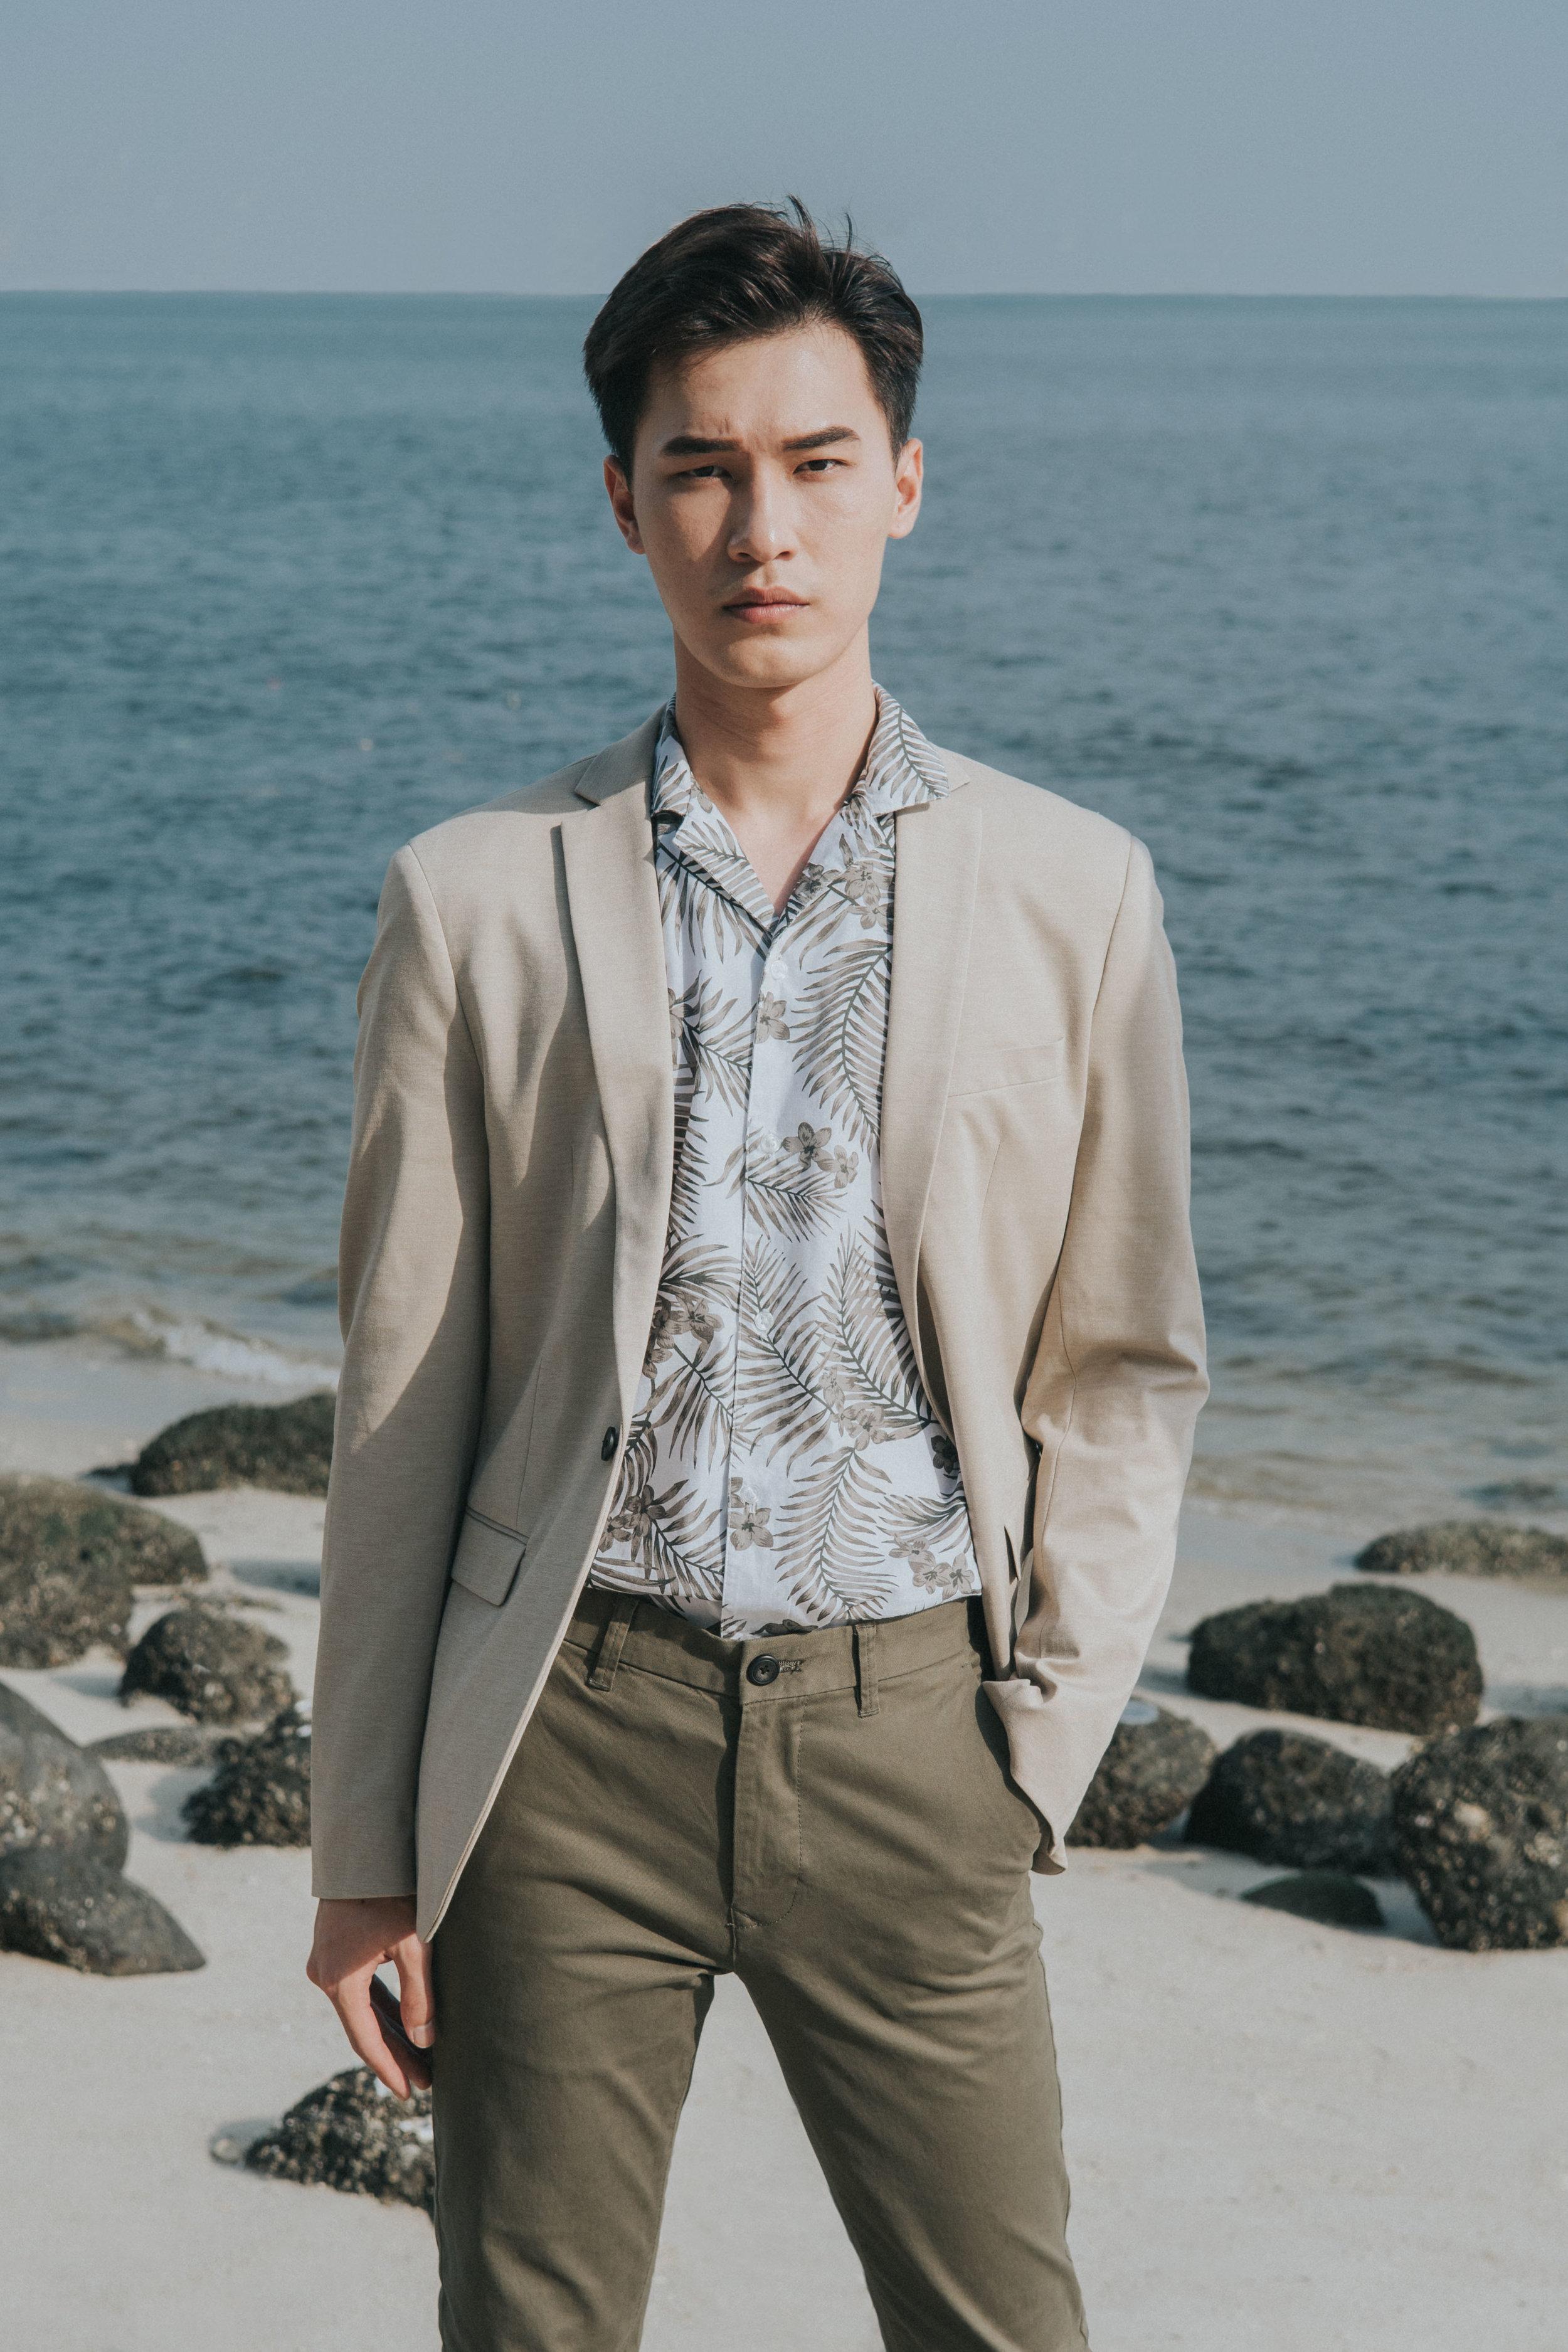 Fashion Shoot for WT Plus Singapore